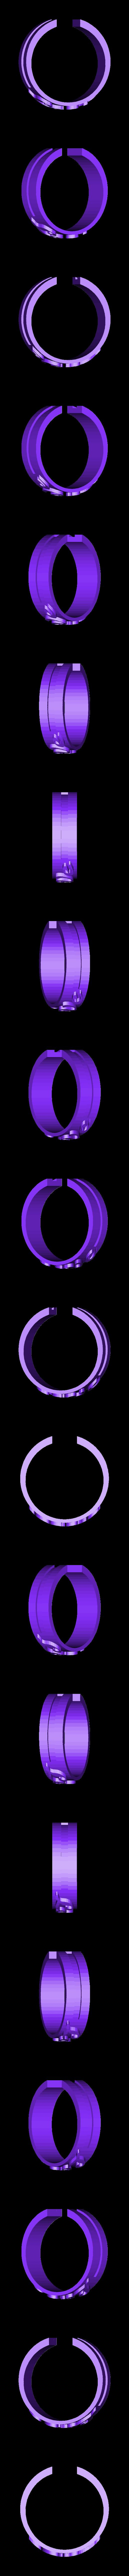 anillo love abierto hendidura 22.stl Télécharger fichier STL gratuit Anillo / Ring Love • Design pour impression 3D, amg3D